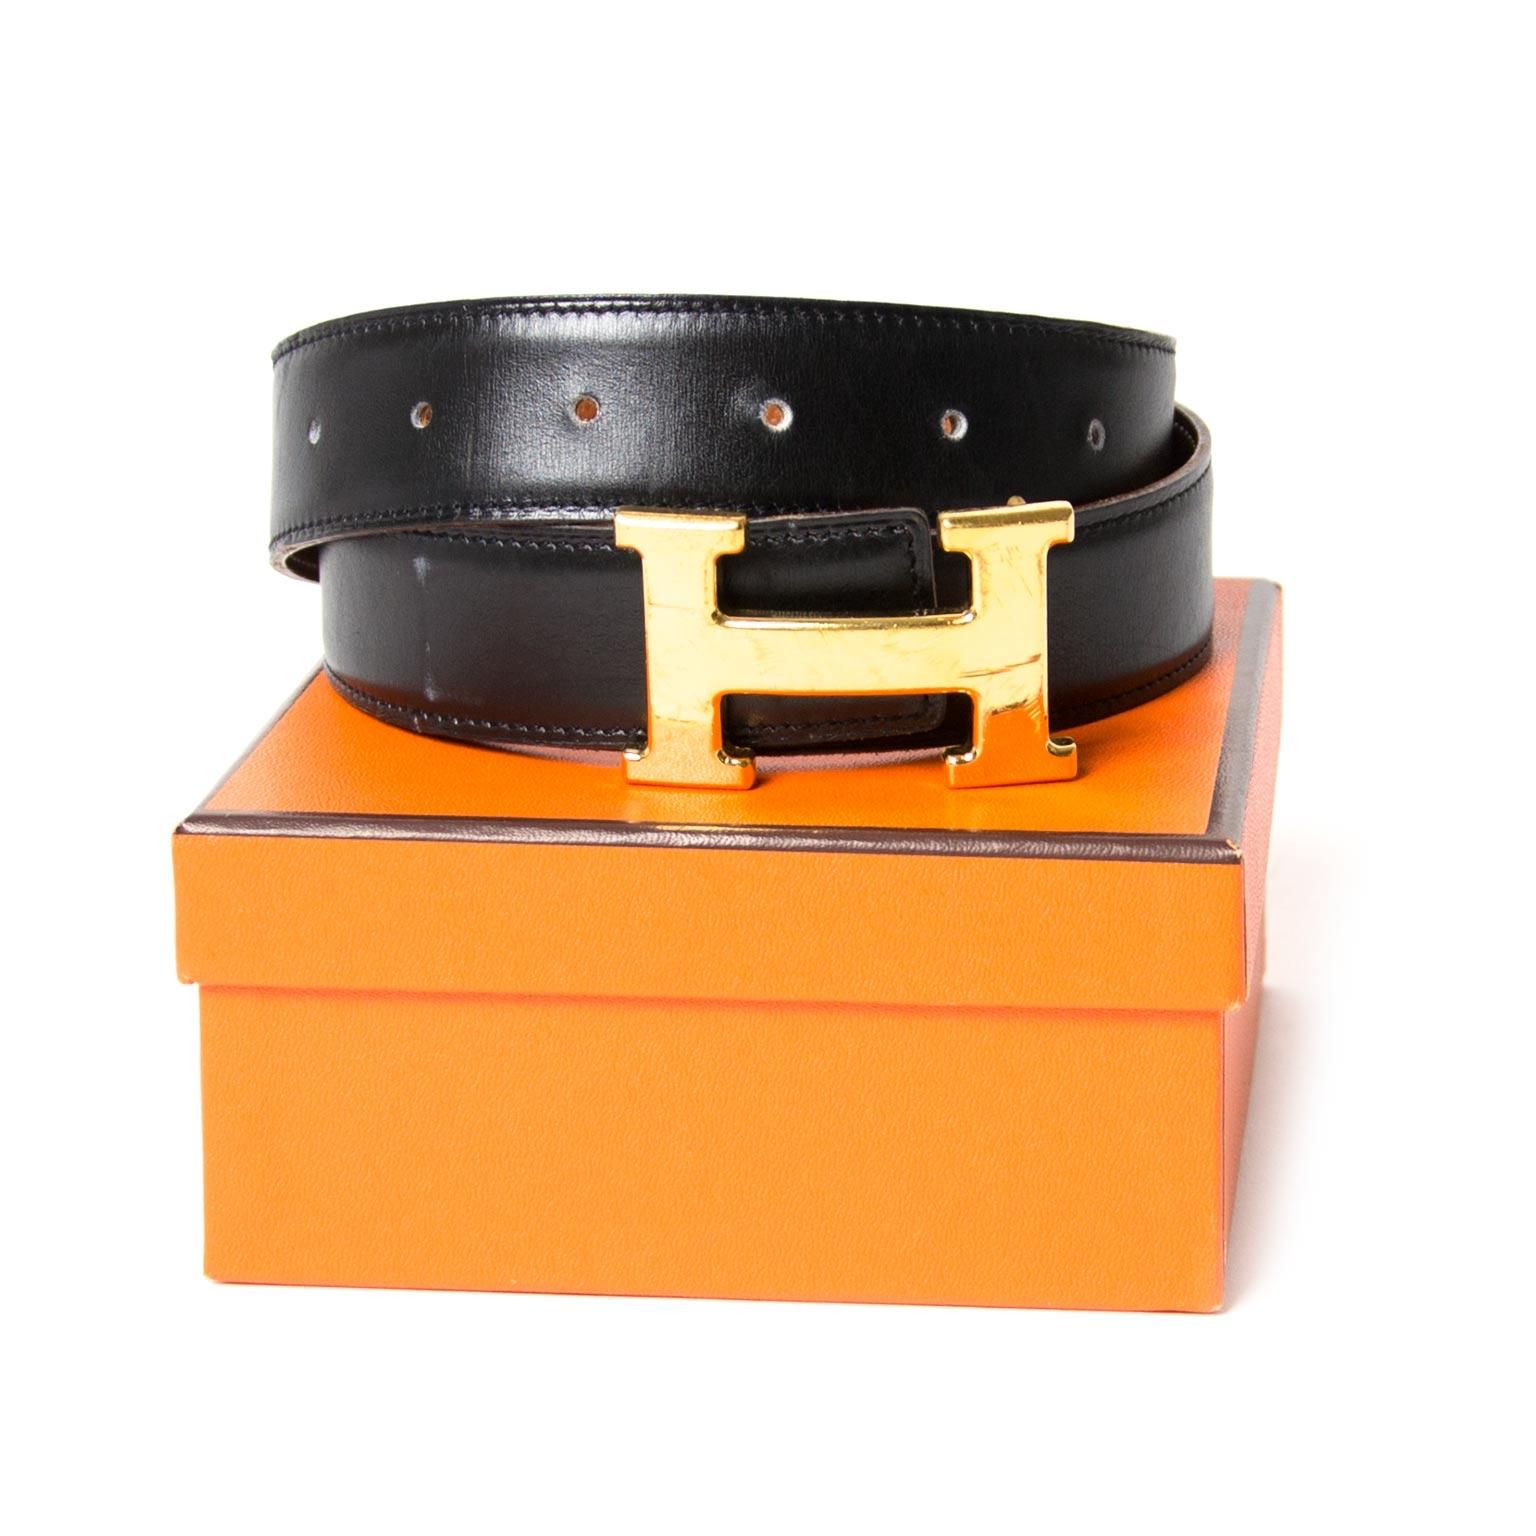 Hermès Reversible Black/Brown Constance H Belt - Size 80 now for sale at labellov vintage fashion webshop belgium